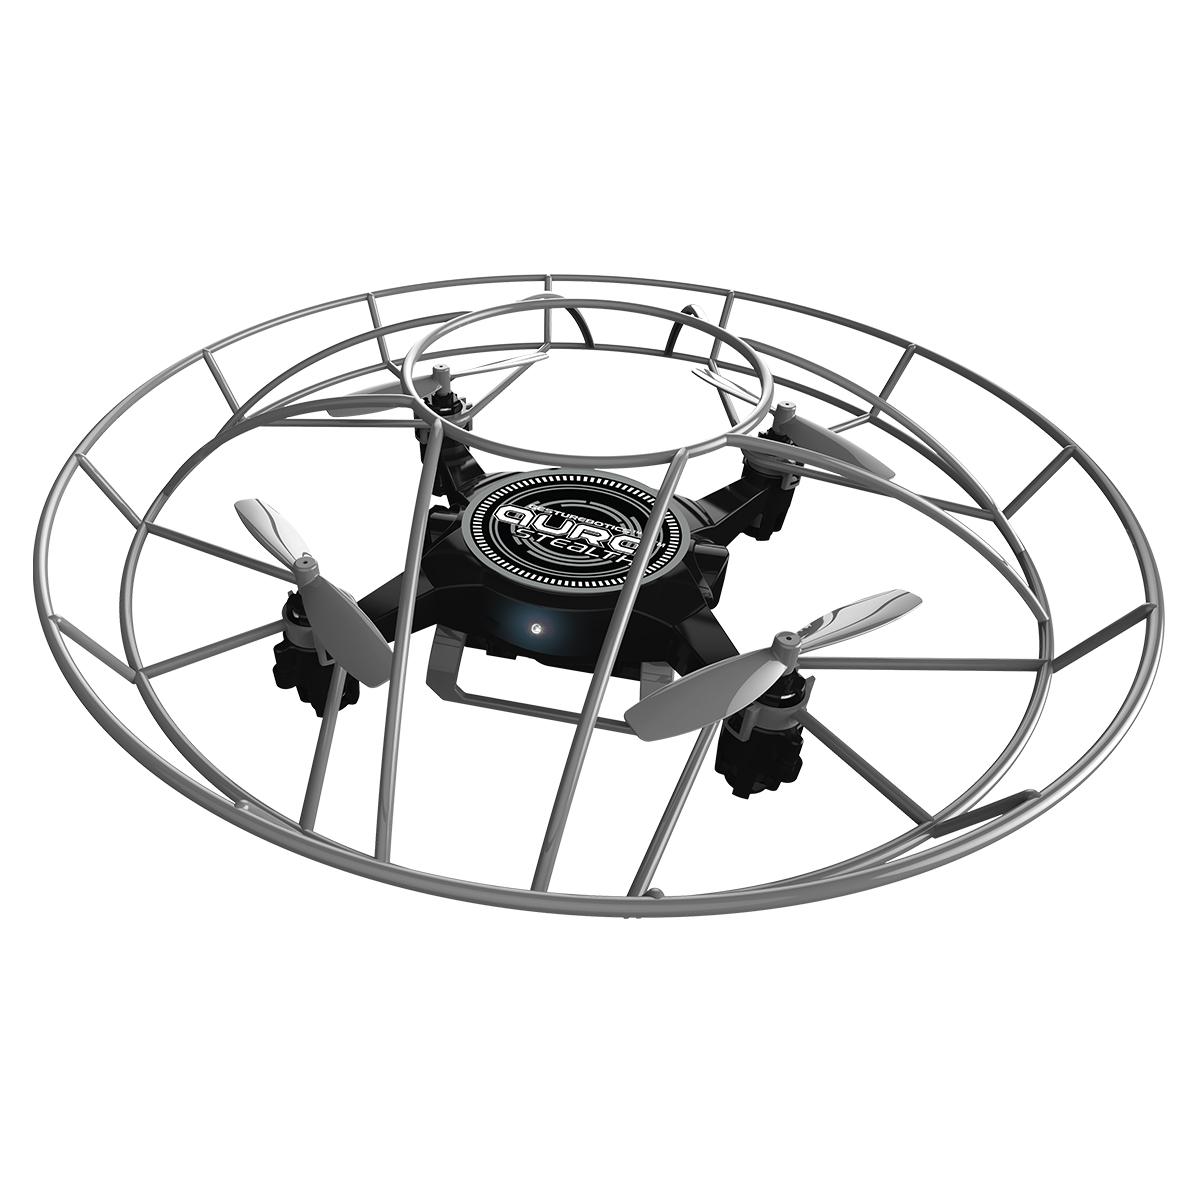 Kd Interactive Aura Stealth Drone